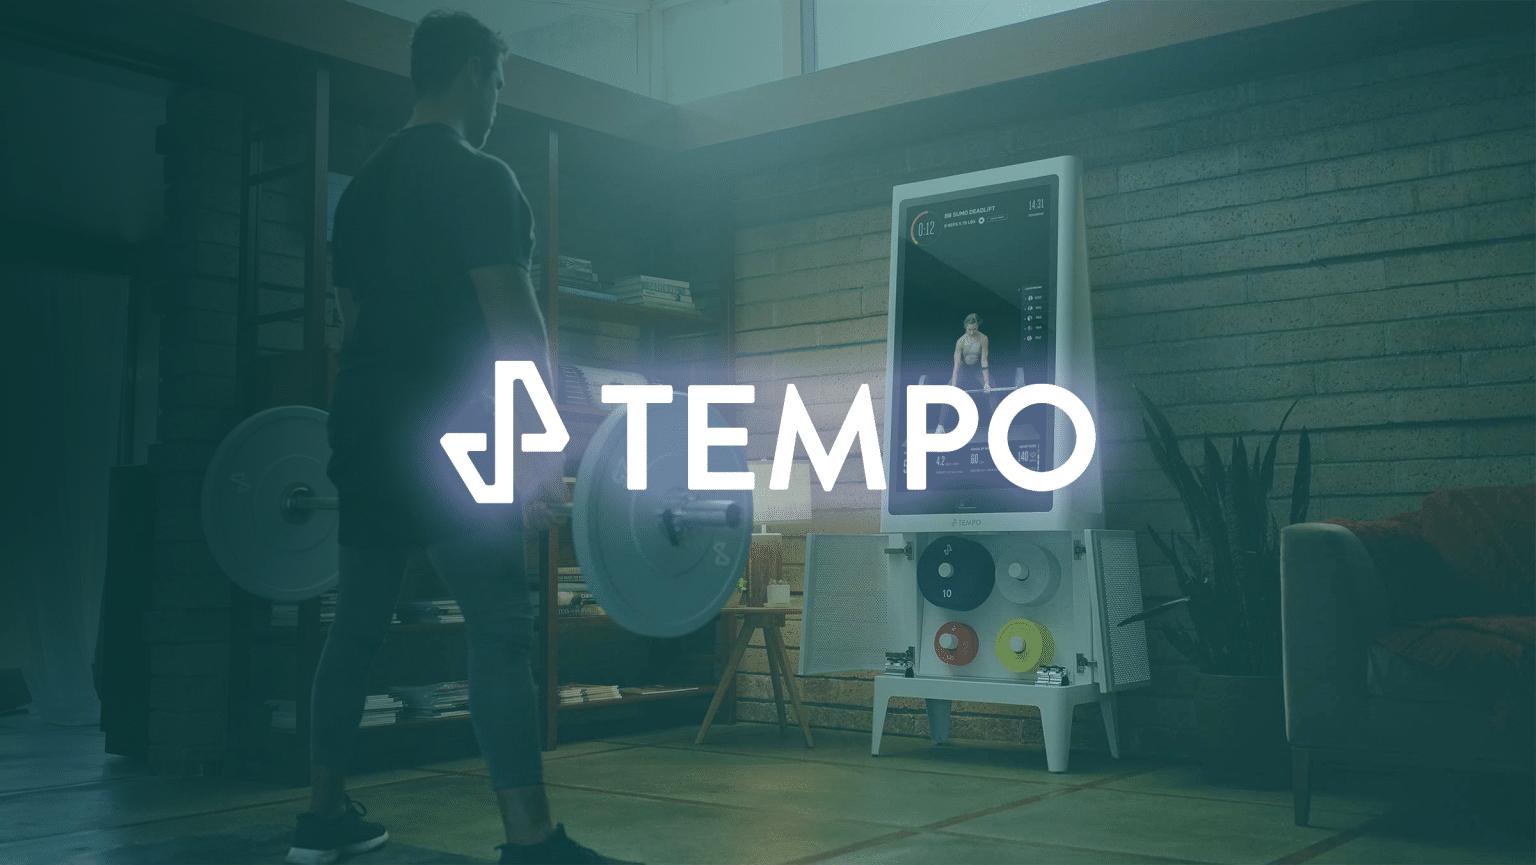 tempo logo featured image